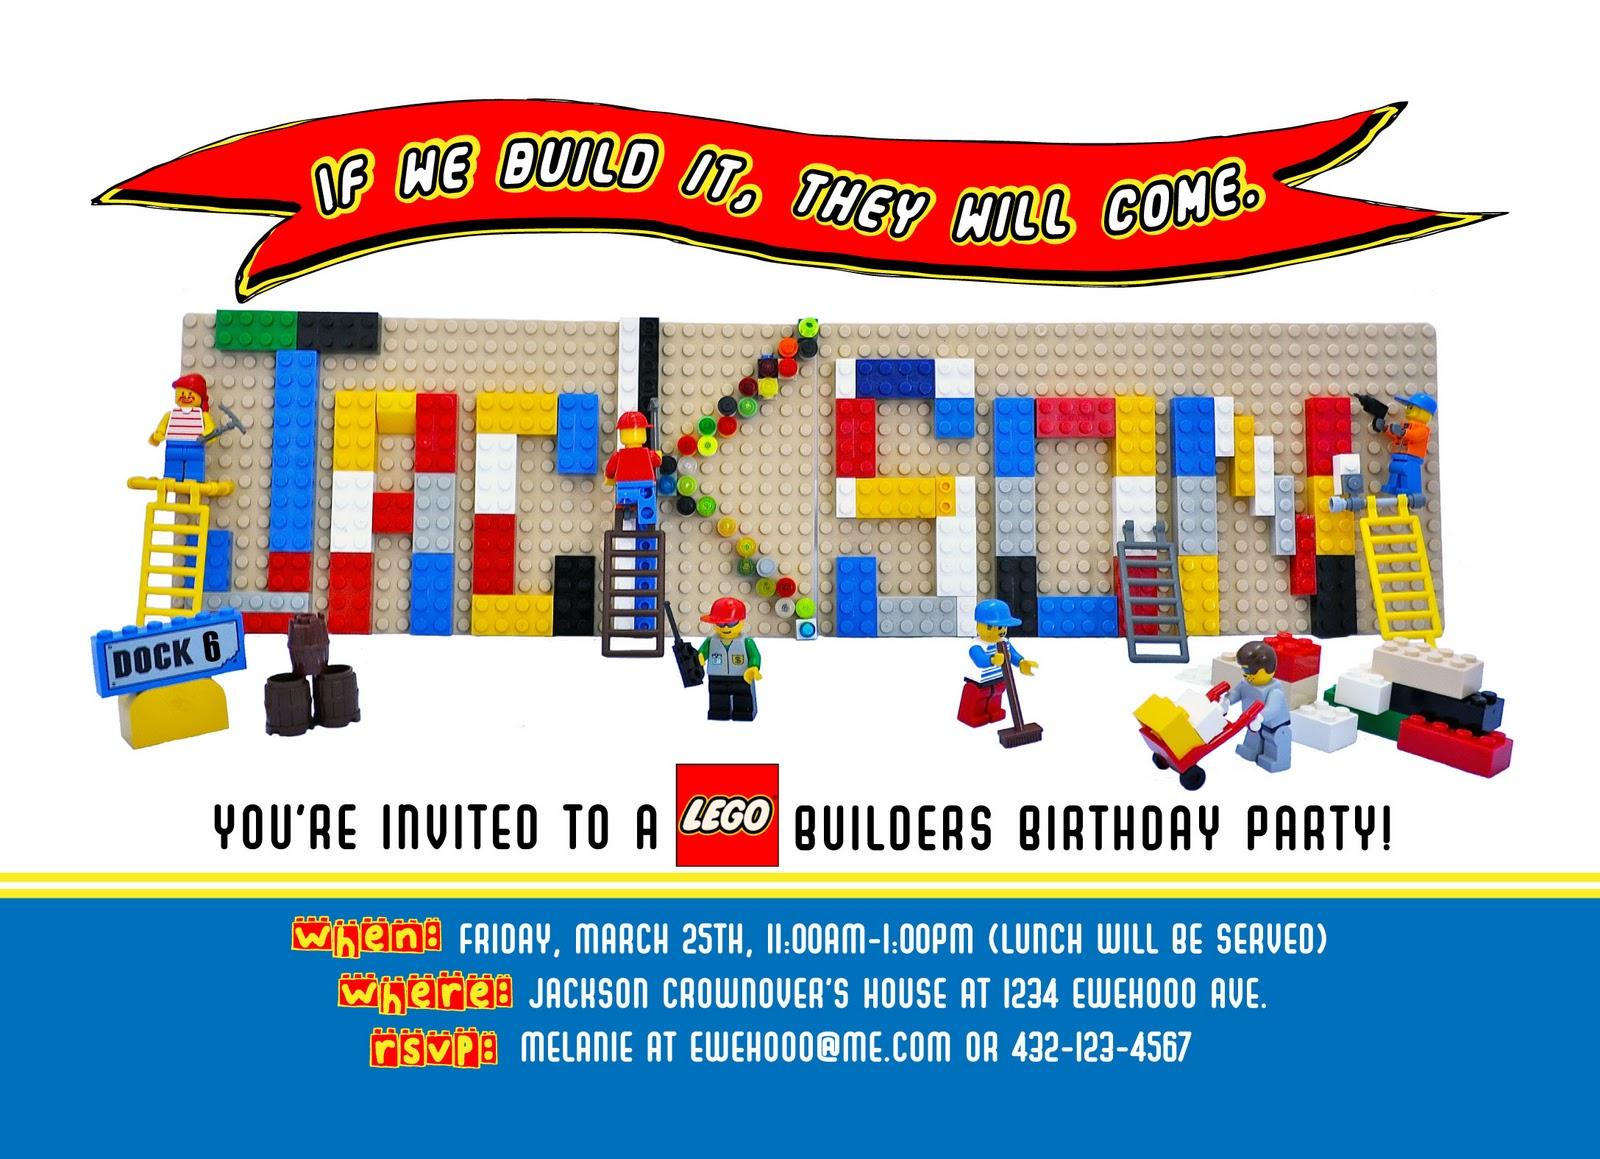 ewe hooo Lego Birthday Party Sneak Peek – Lego Birthday Party Invitations